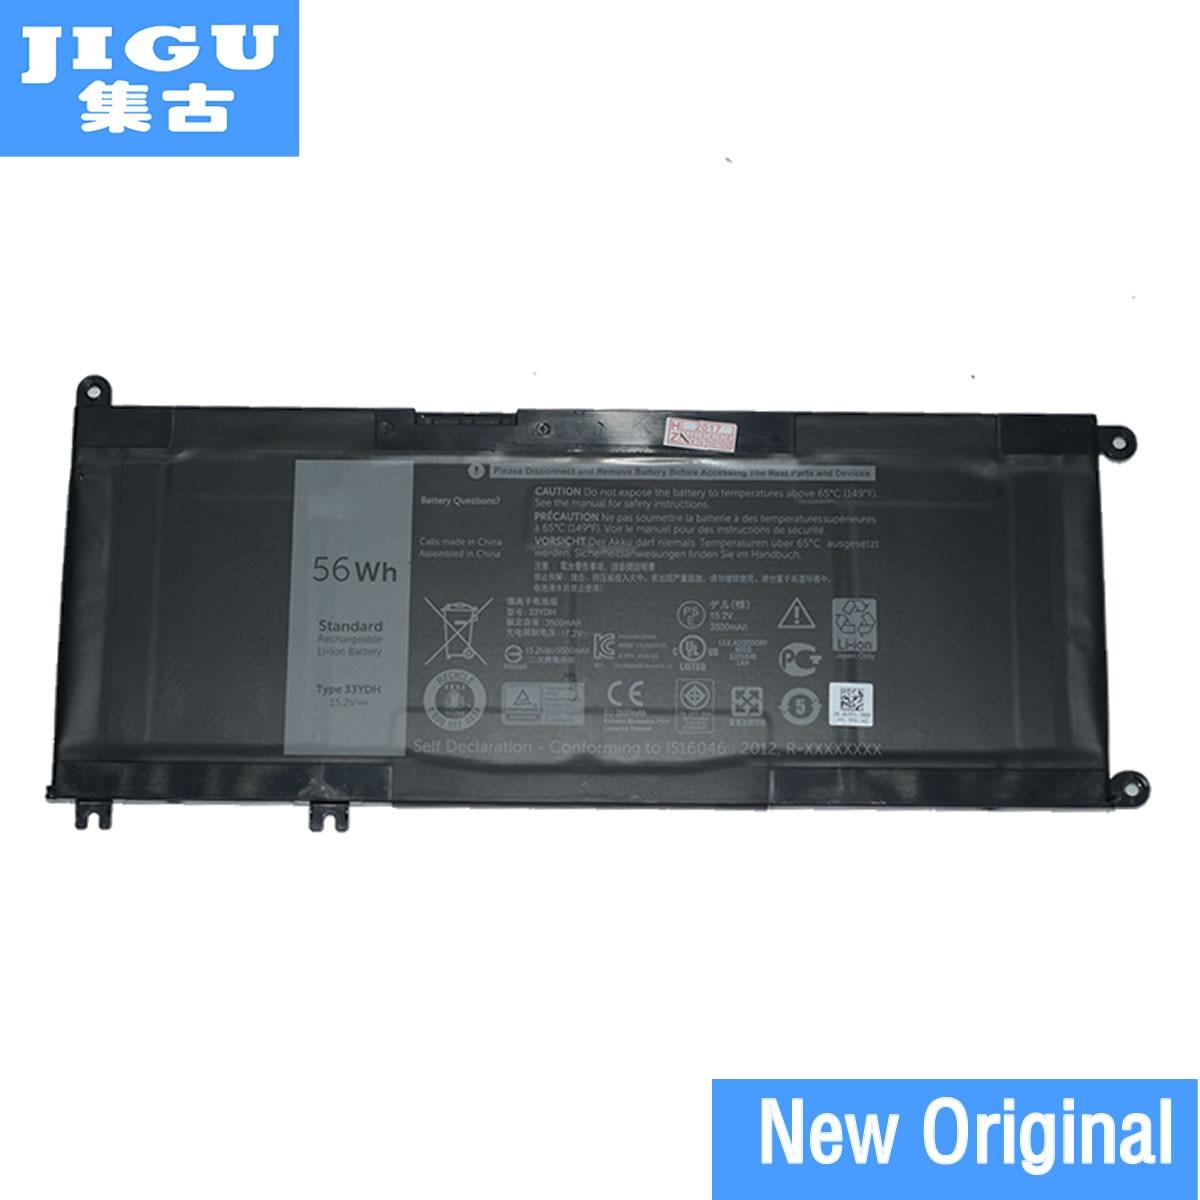 JIGU Original Laptop Battery 33YDH For DELL For Inspiron 17 7778 7779